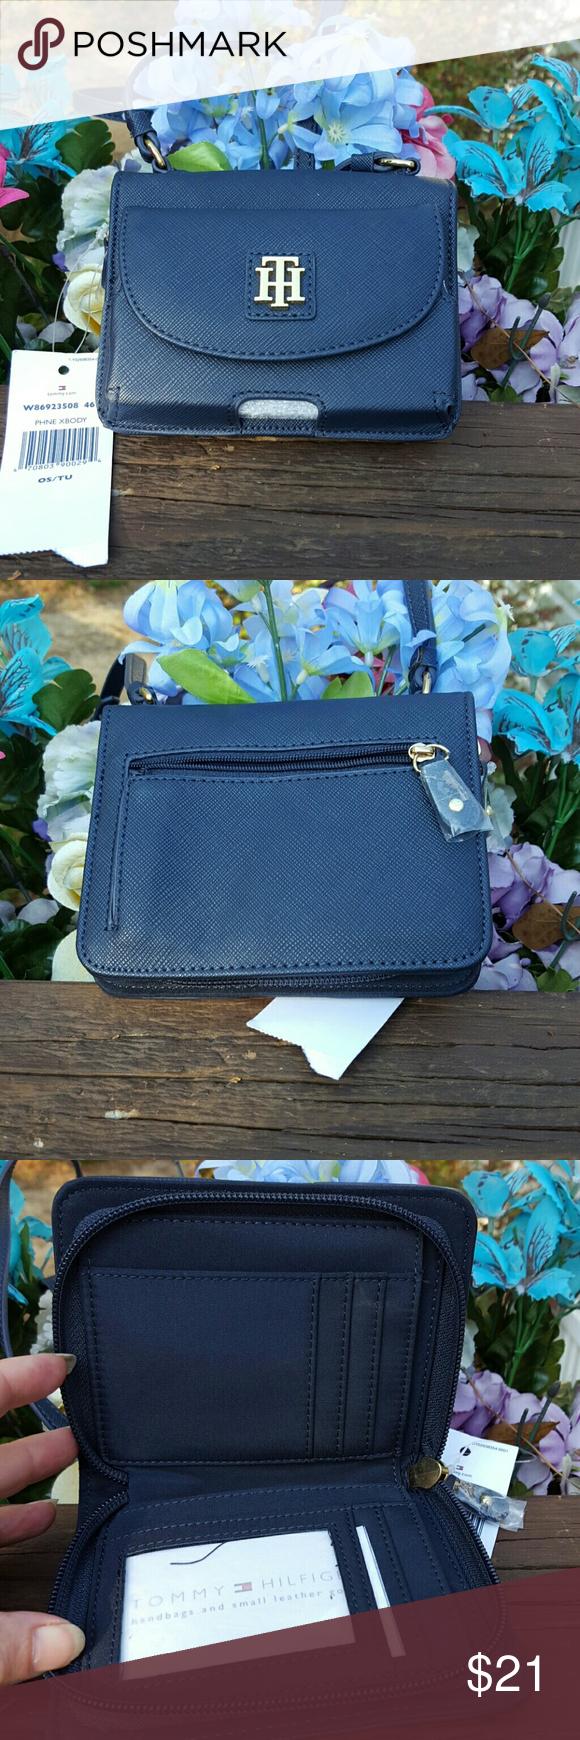 Purse Tommy Hilfiger shoulder strap purse navy Tommy Hilfiger  Bags Mini Bags